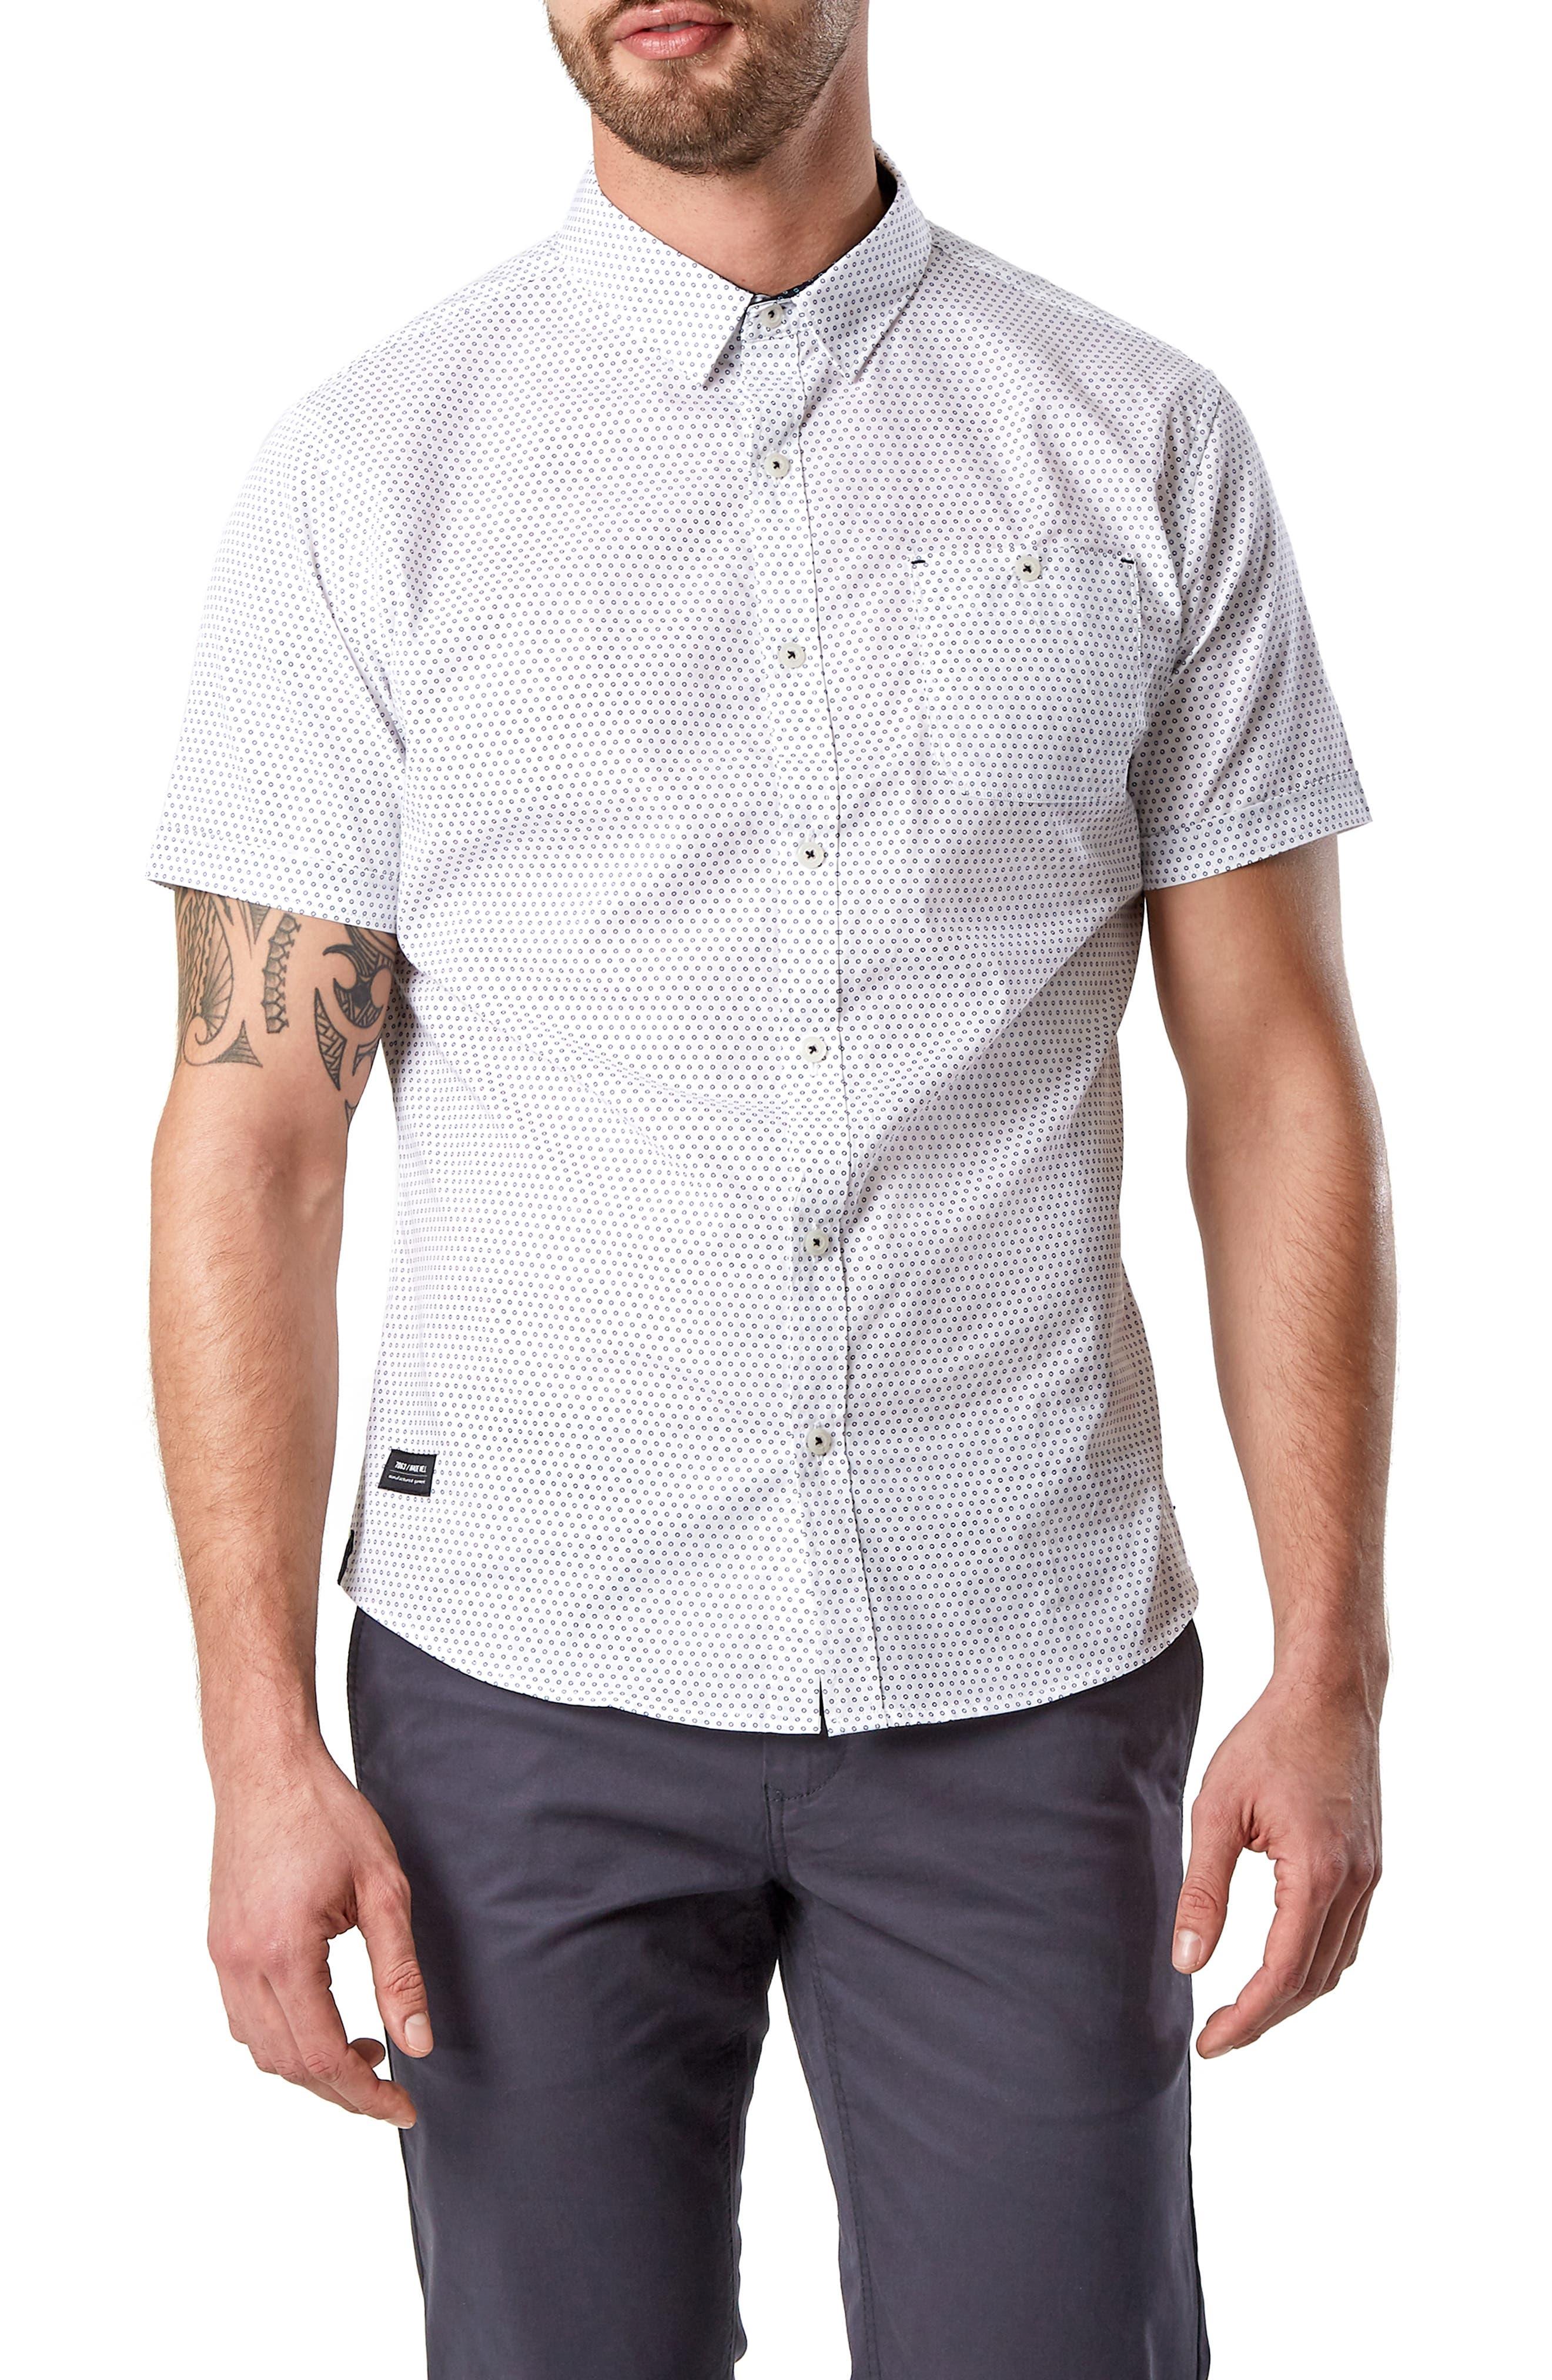 Suavecito Slim Fit Sport Shirt,                             Main thumbnail 1, color,                             WHITE